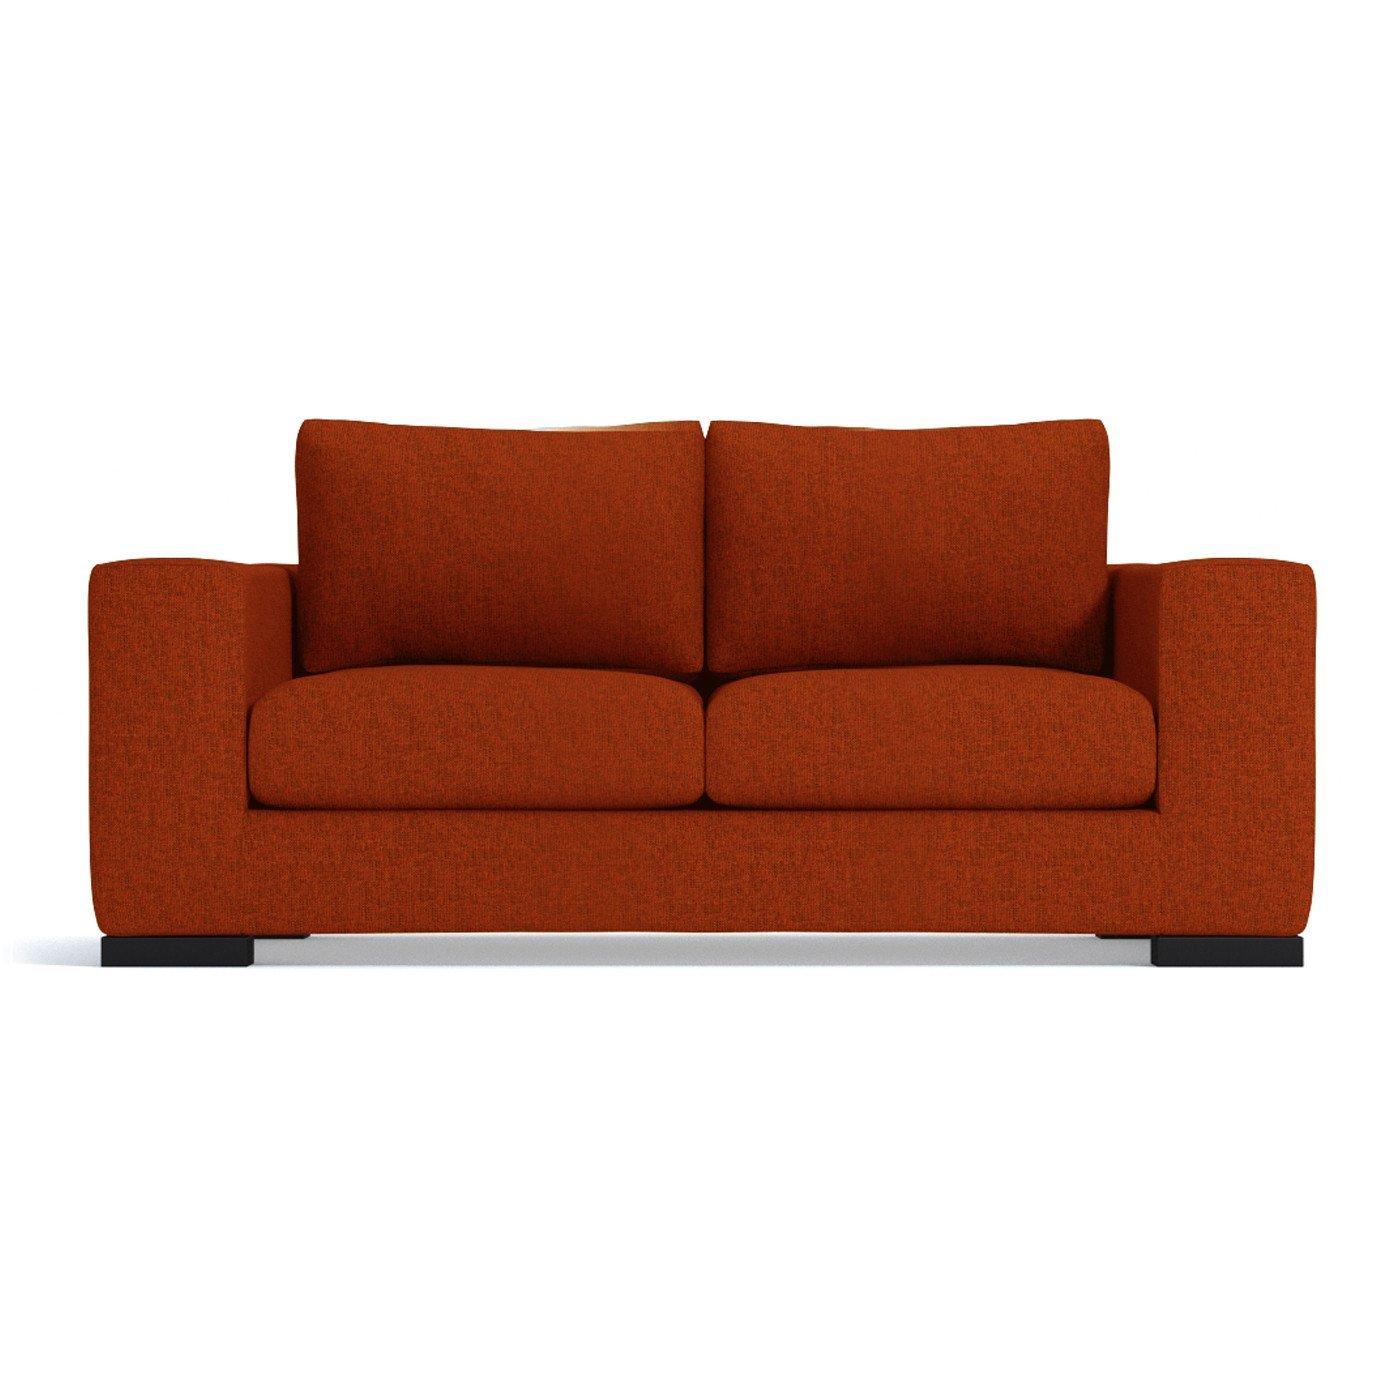 Amazon.com: Hillandale Apartment Size Sofa, Pumpkin, 66